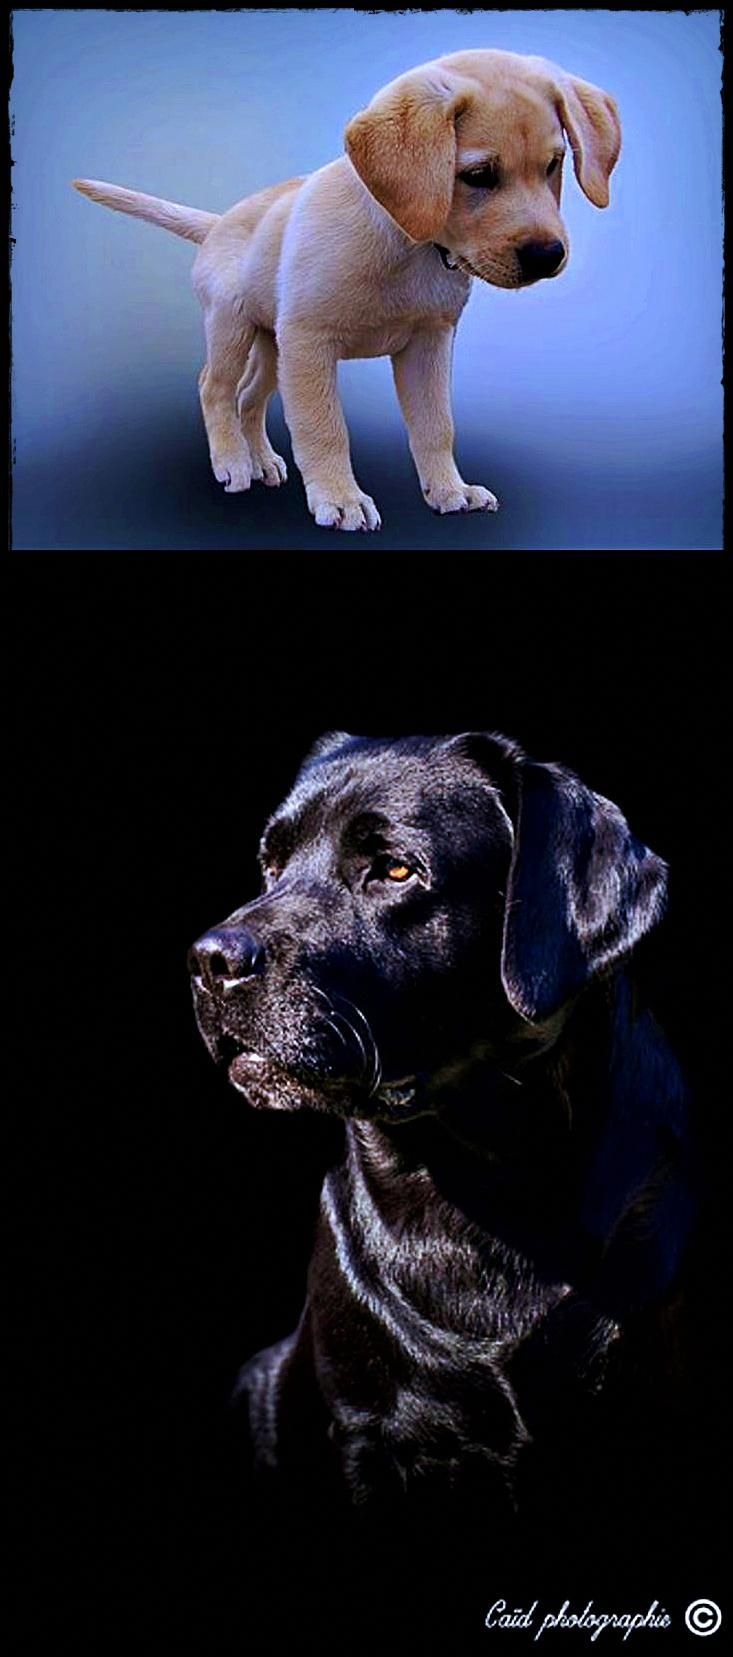 Labrador For Sale Near Me Get This Now Labradordiarrhea Labradorpuppiesyeovil Labradorrescuehull With Images Labrador Puppy Labrador Puppies For Sale Dog Breeds